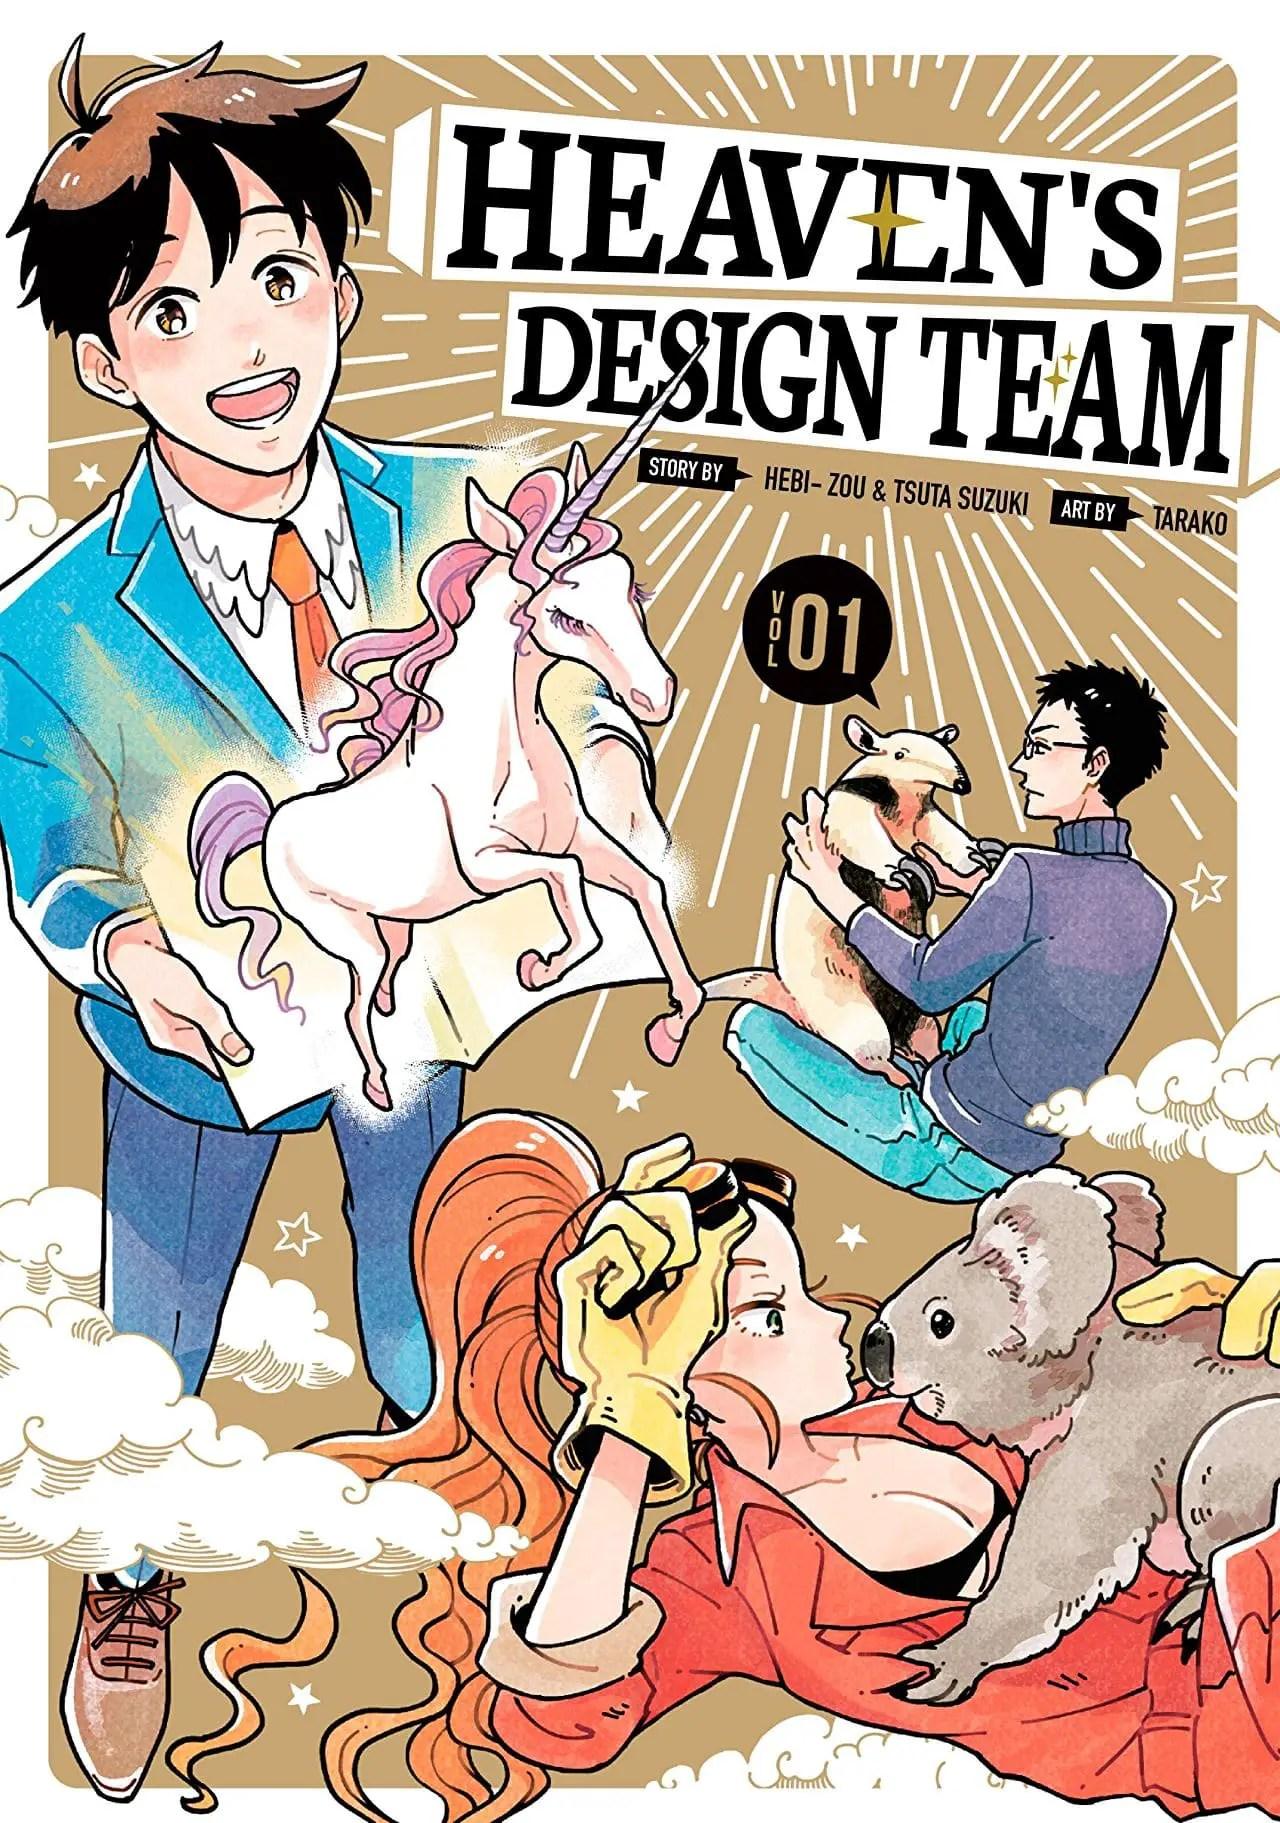 Heaven's Design Team Vol. 1 Review